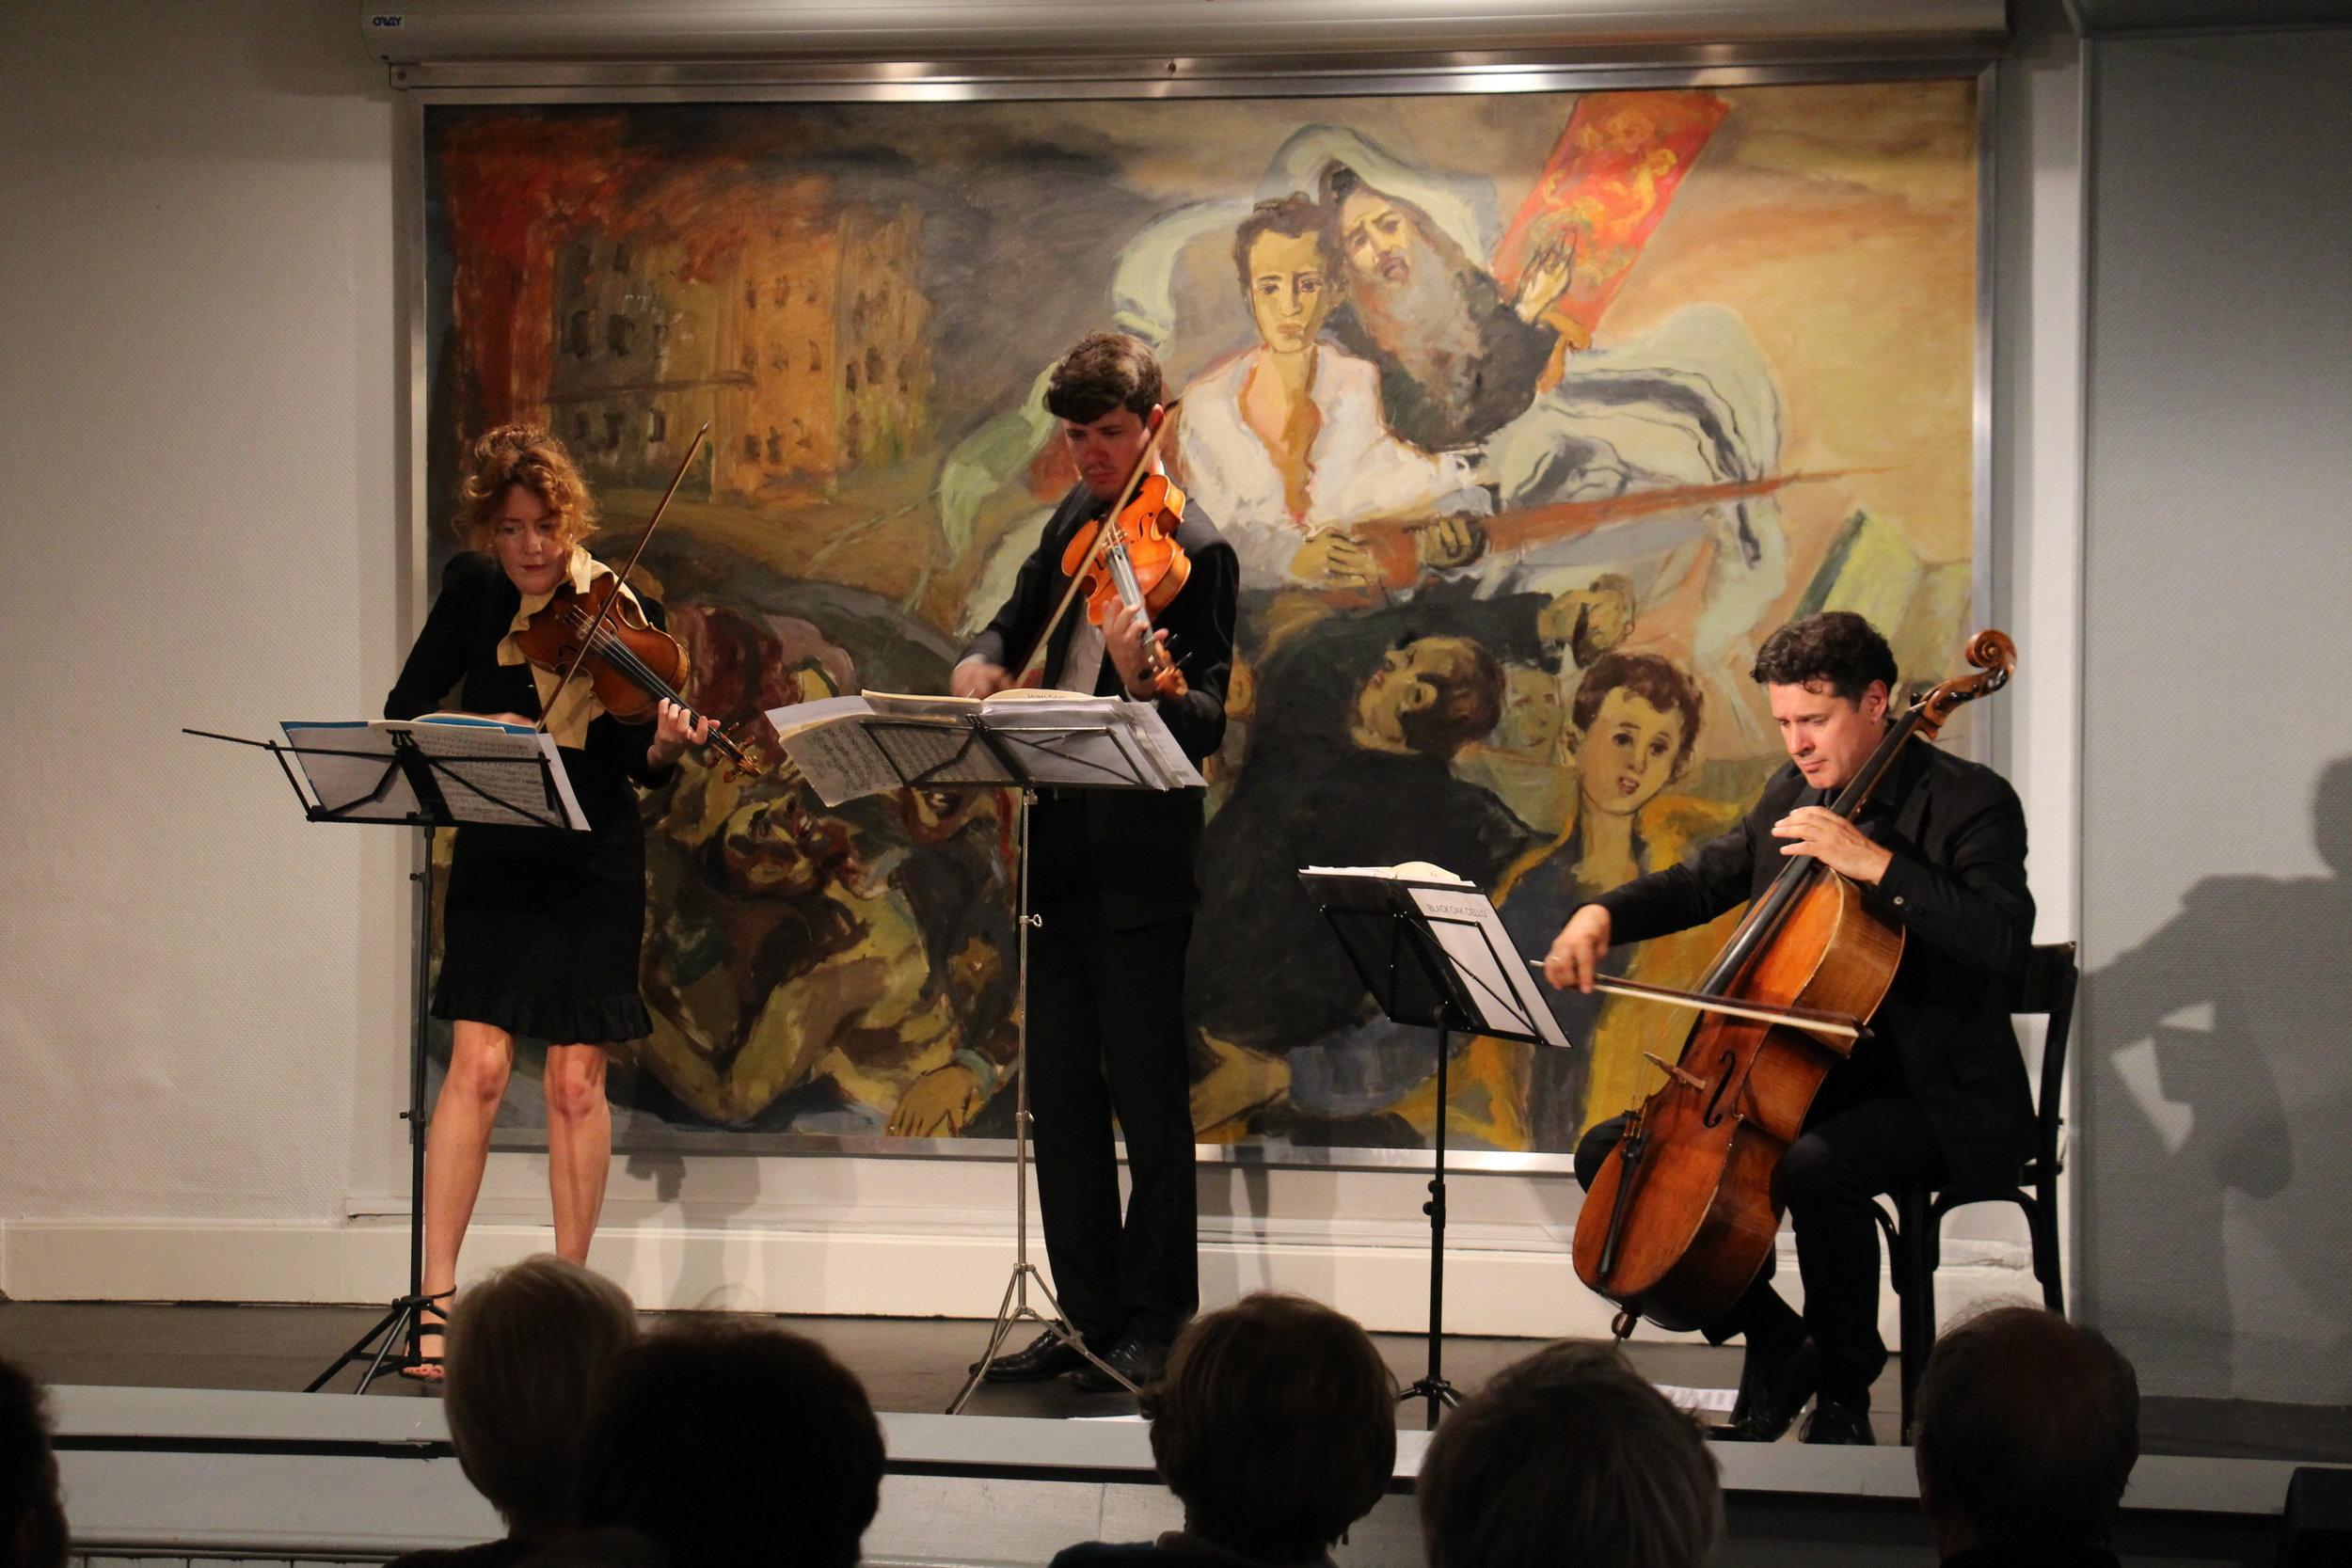 Desirée Ruhstrat, Violin / Aurélien Fort Pederzoli, Viola / David Cunliffe, Cello